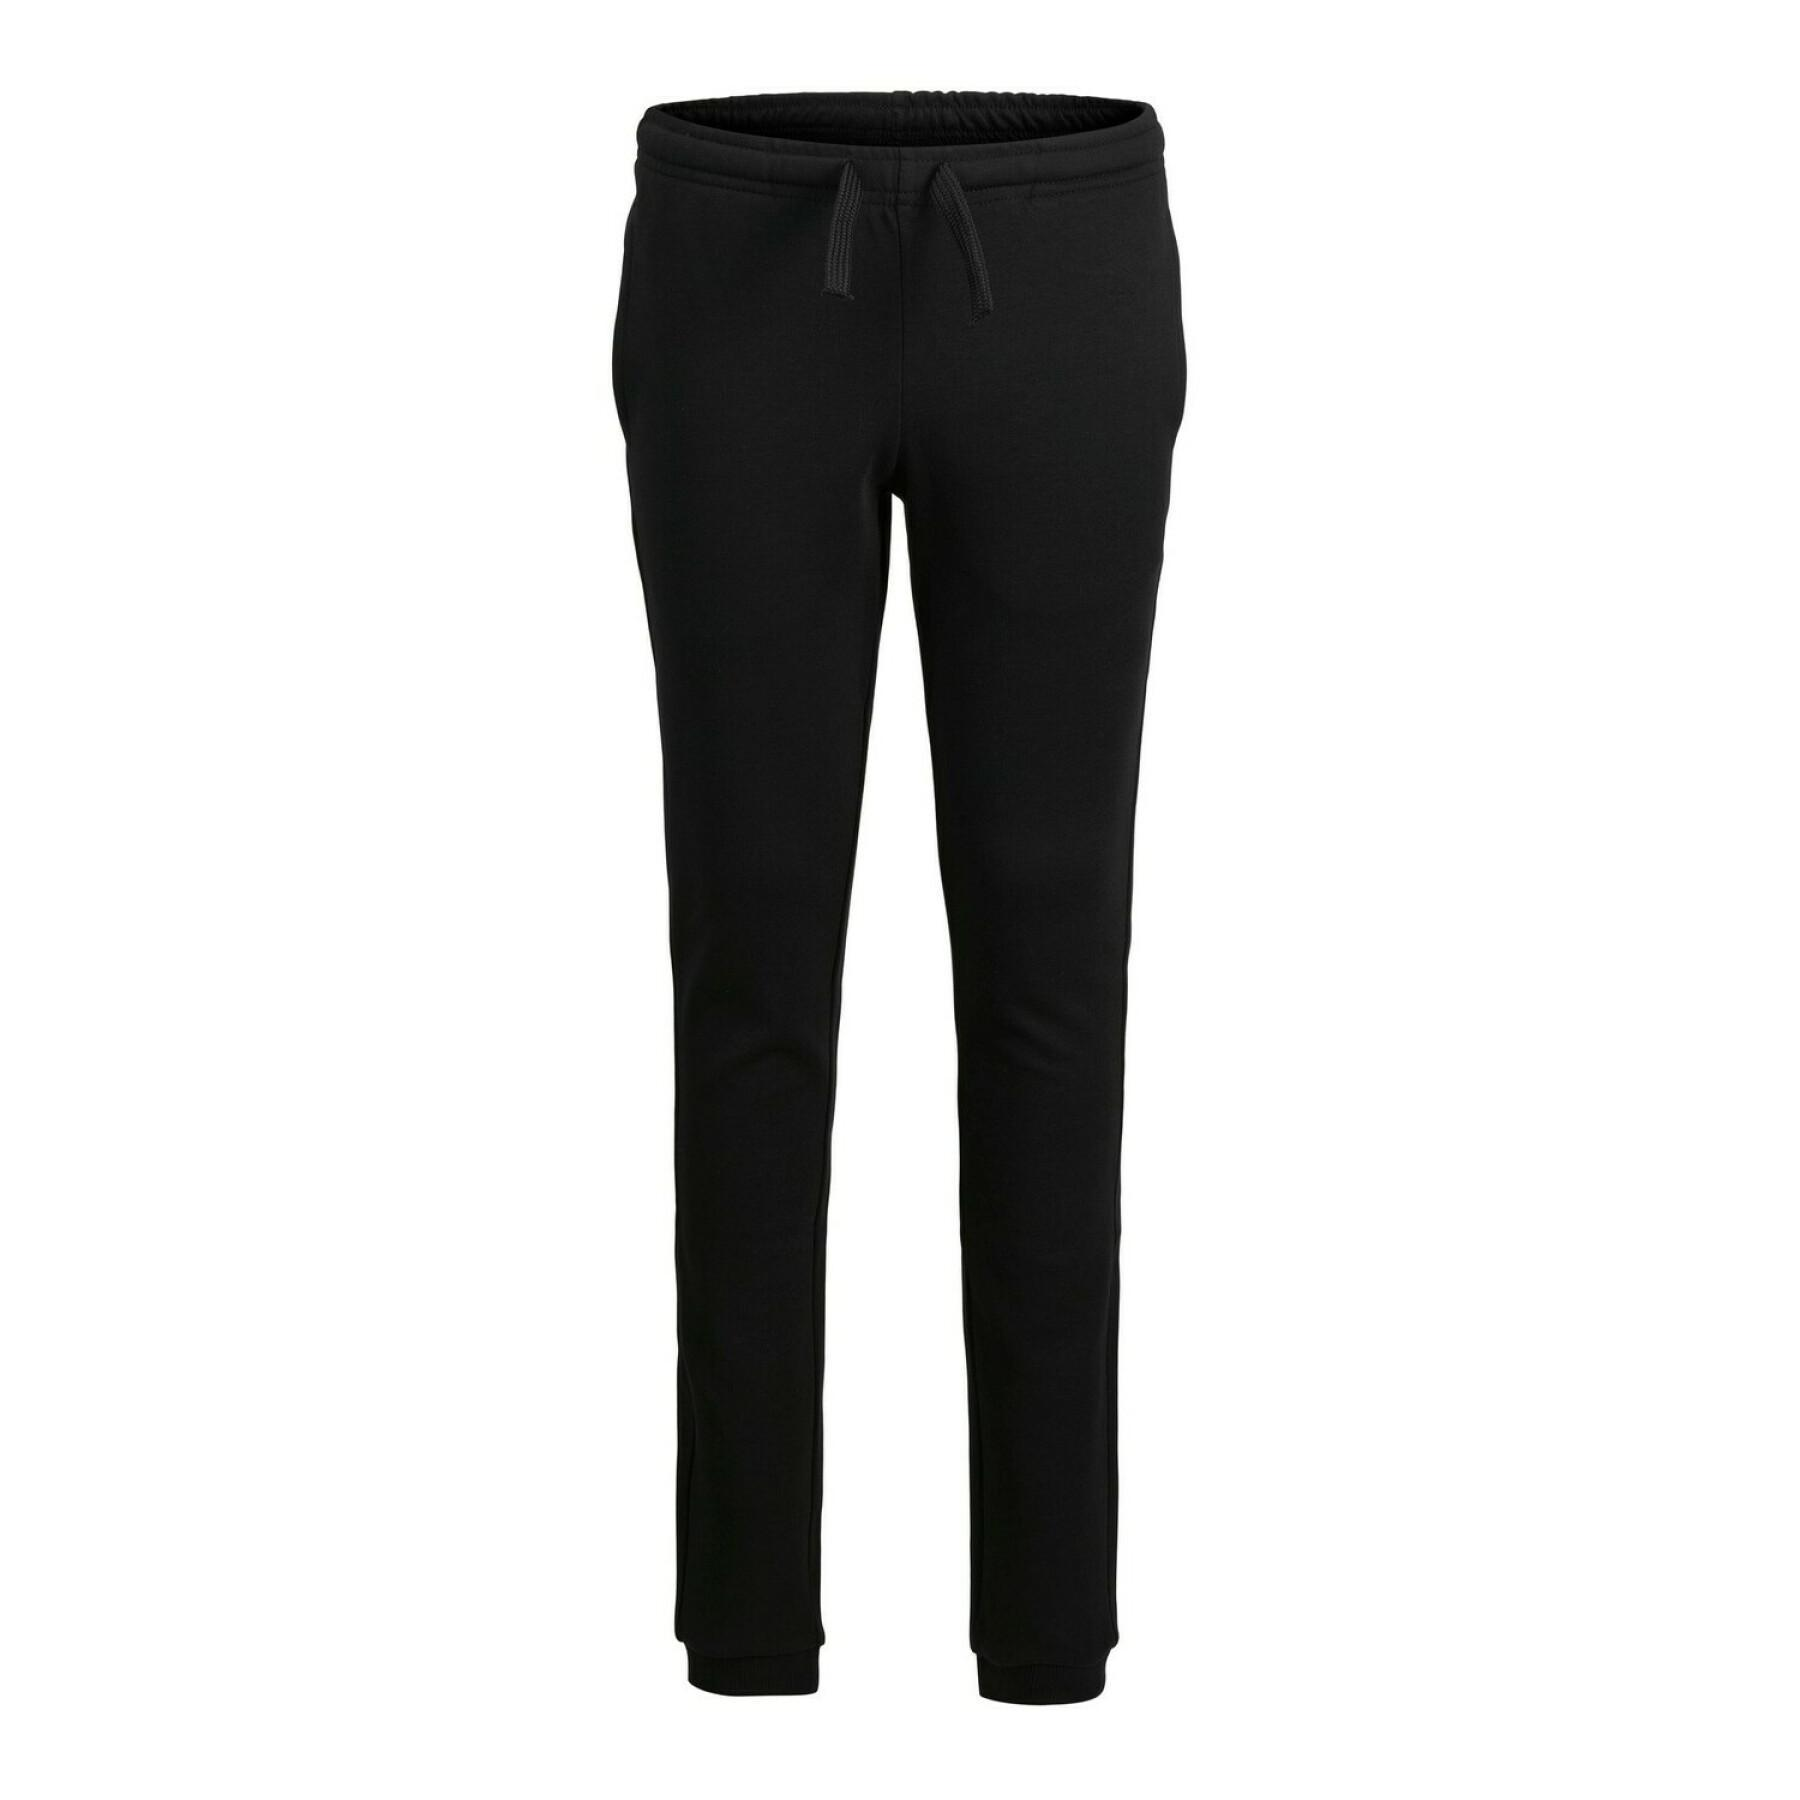 Children's jogging trousers Jack & Jones Basic